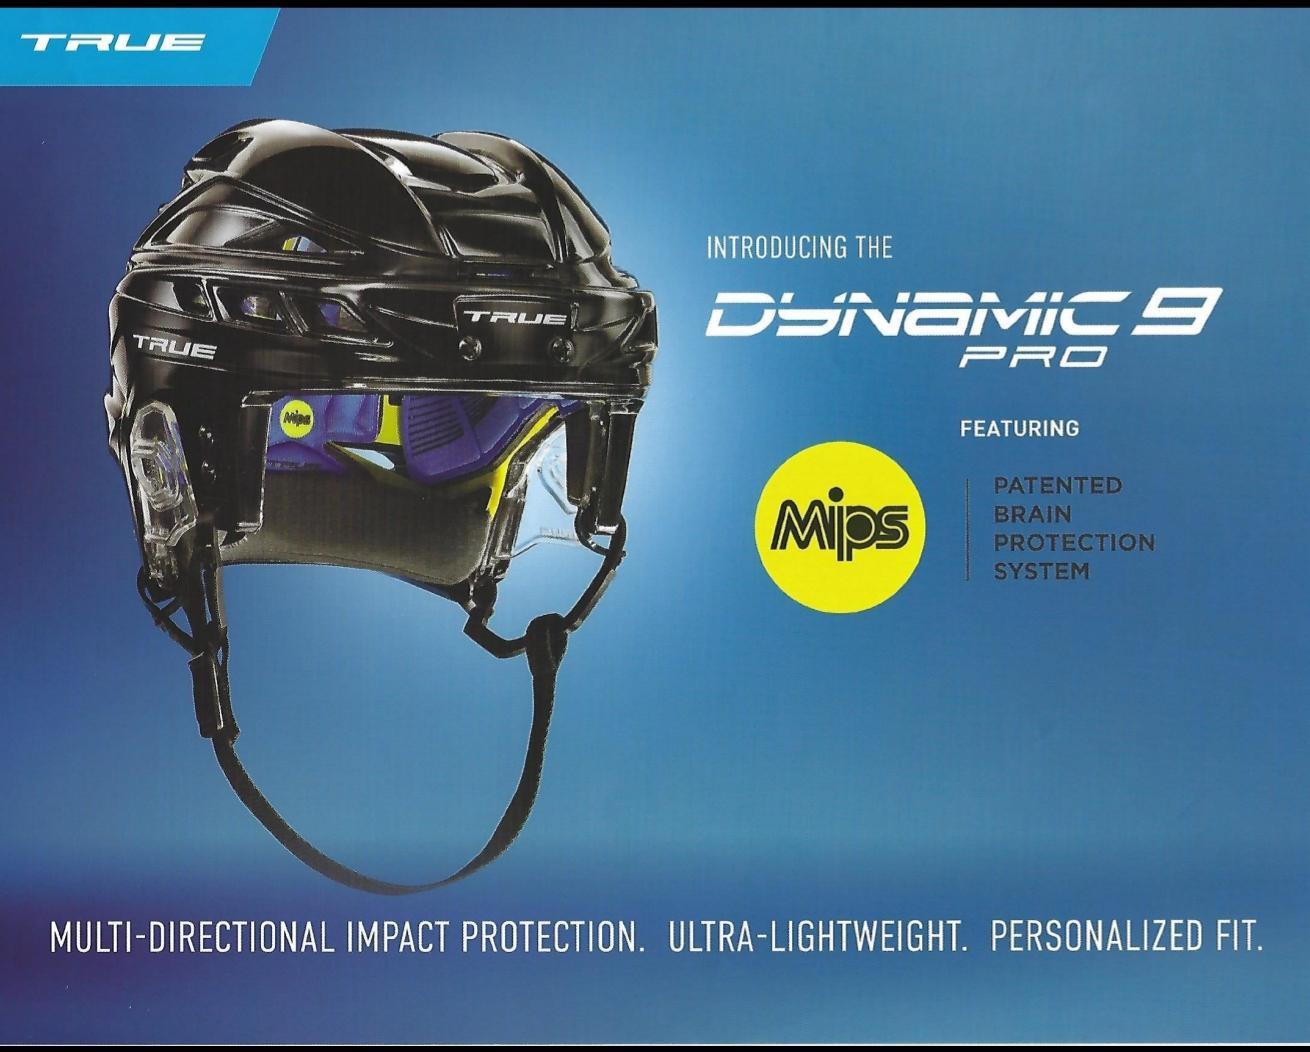 True Hockey's first helmet - Dynamic Pro 9